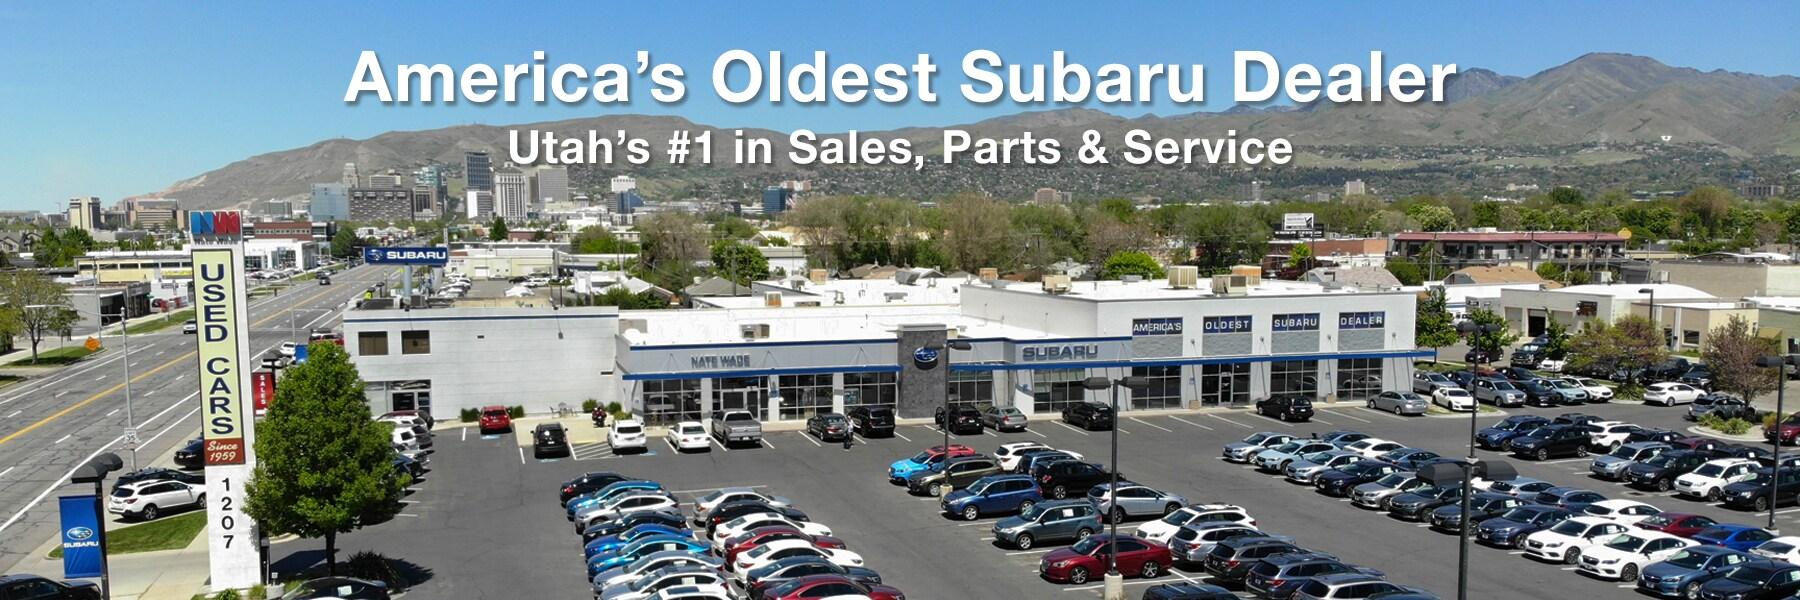 Nate Wade Subaru New Used Car Dealer Salt Lake City Ut Engine Parts Diagram 2000 2 5 Offer